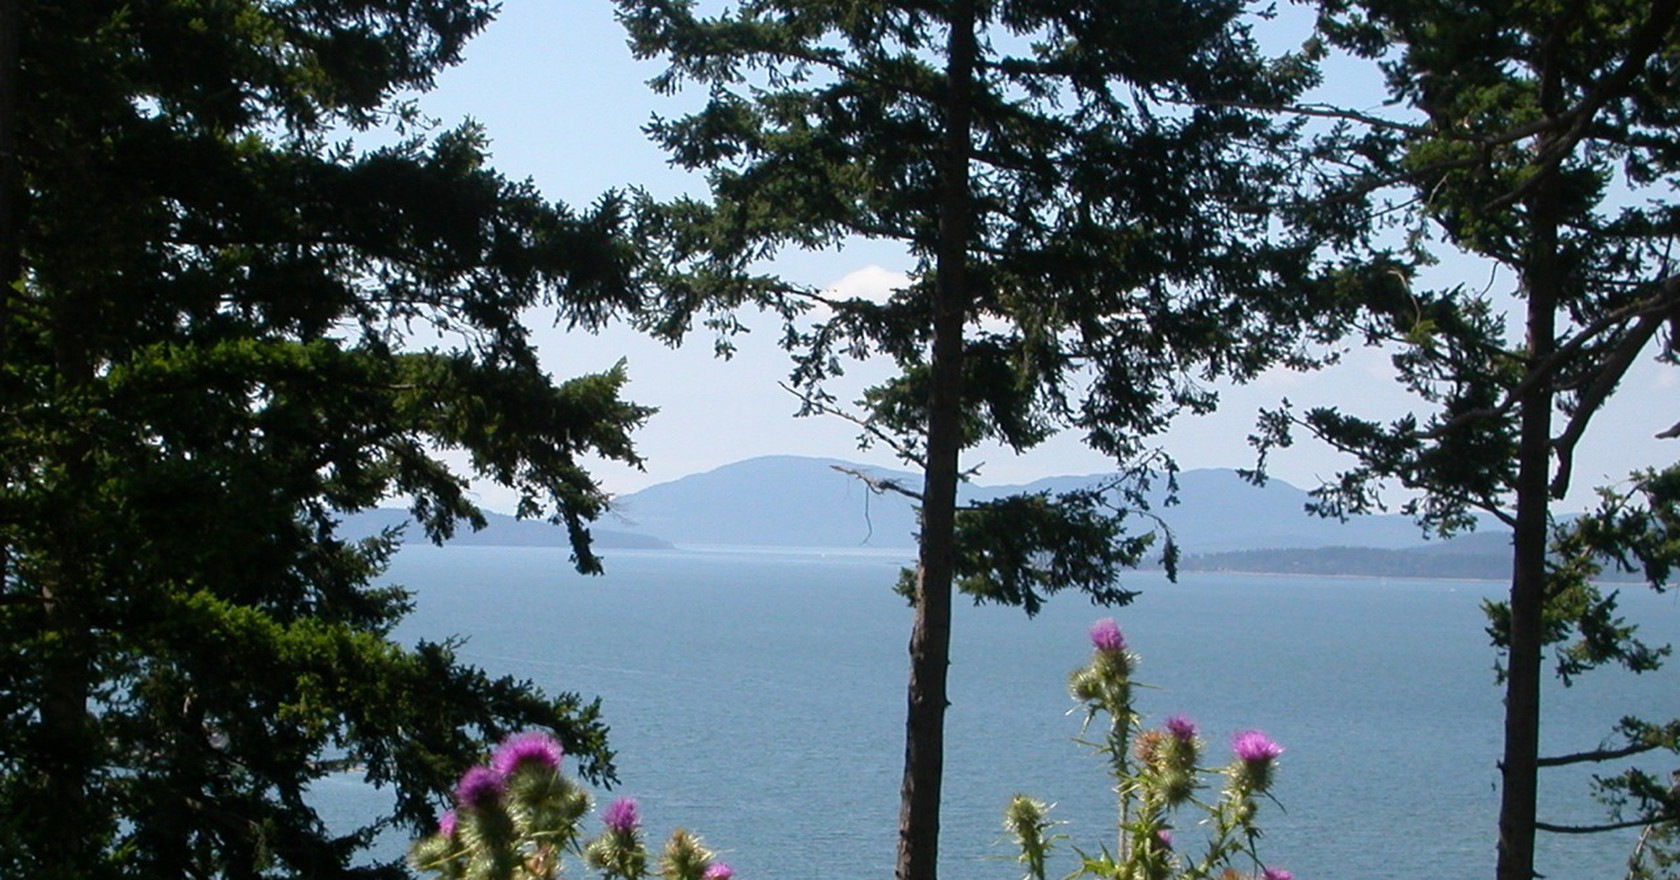 Home To Western Washington University Bellingham Is A Beautiful Coastal Community Kenny Easwaran